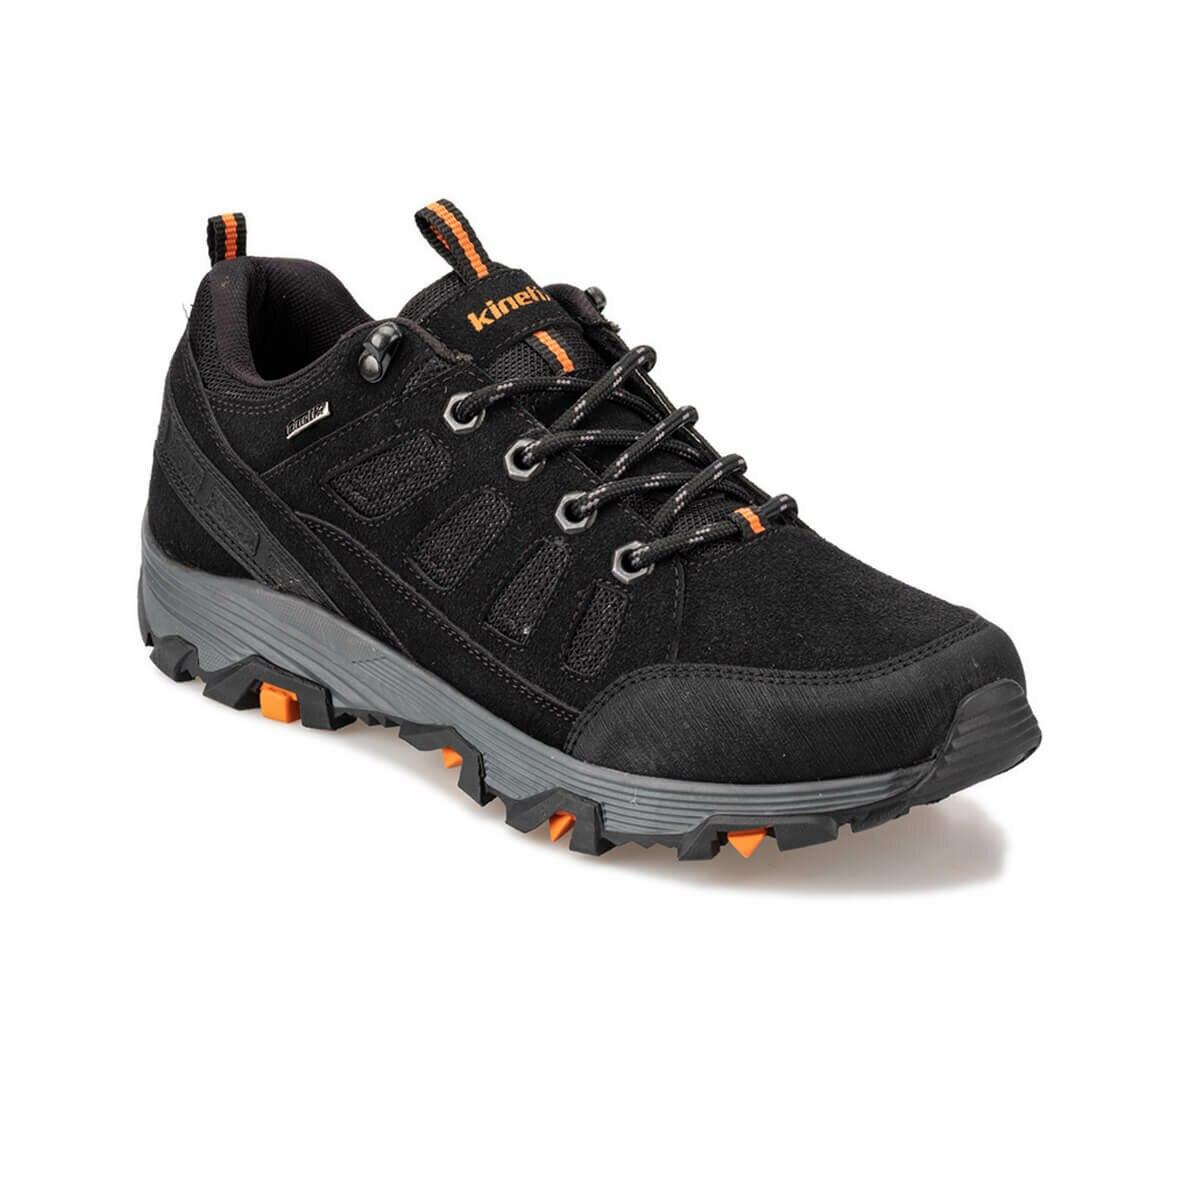 FLO HERES 9PR zapatos masculinos negros KINETIX